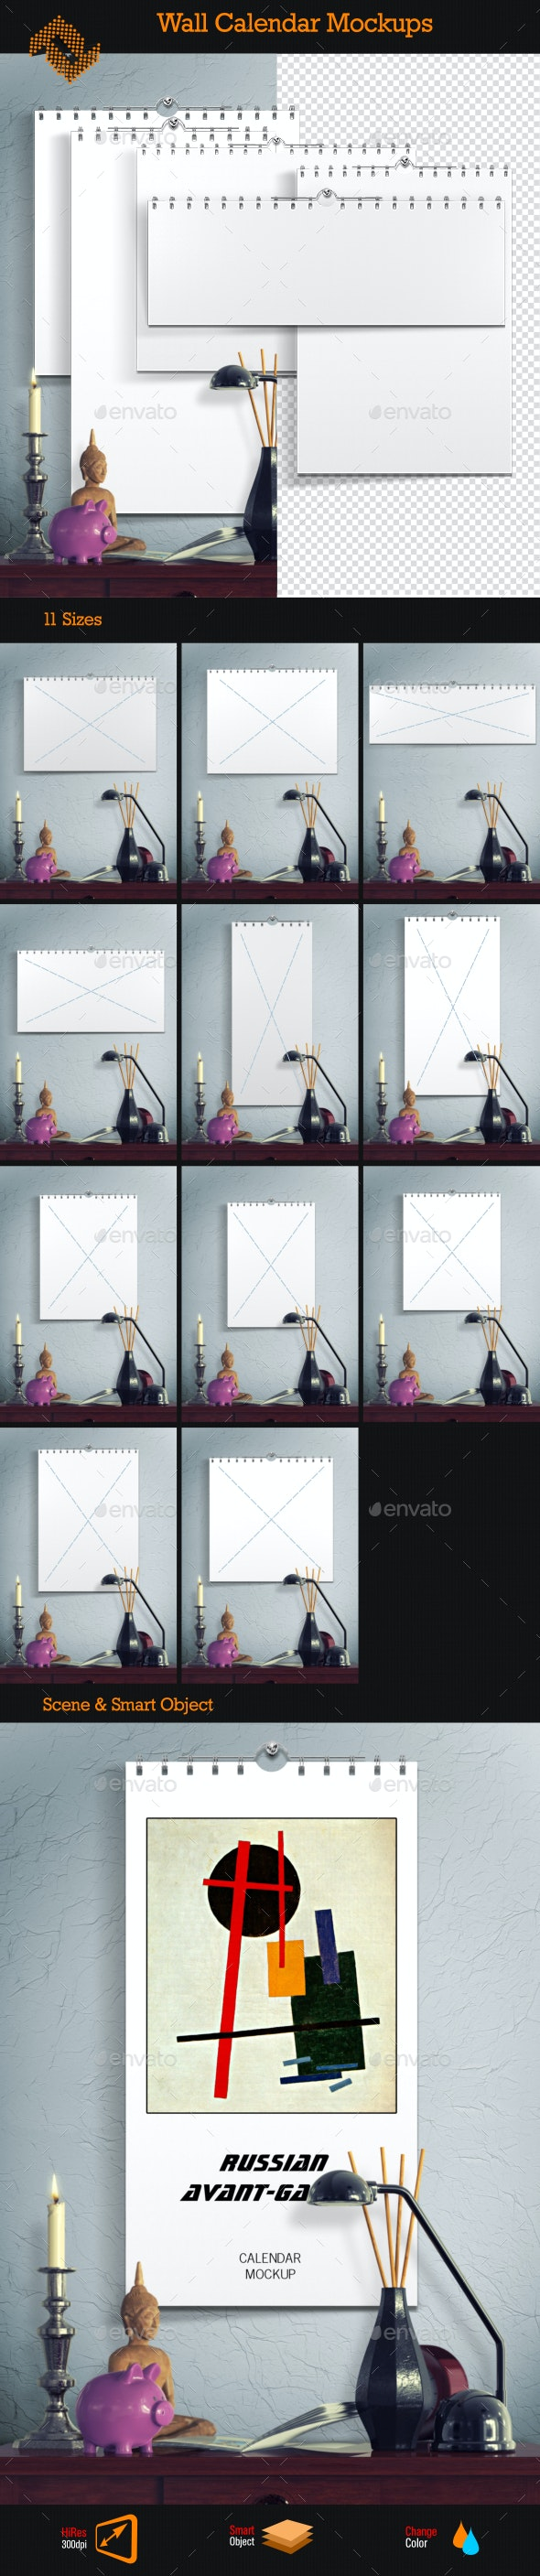 Wall Calendar Mockups - Print Product Mock-Ups